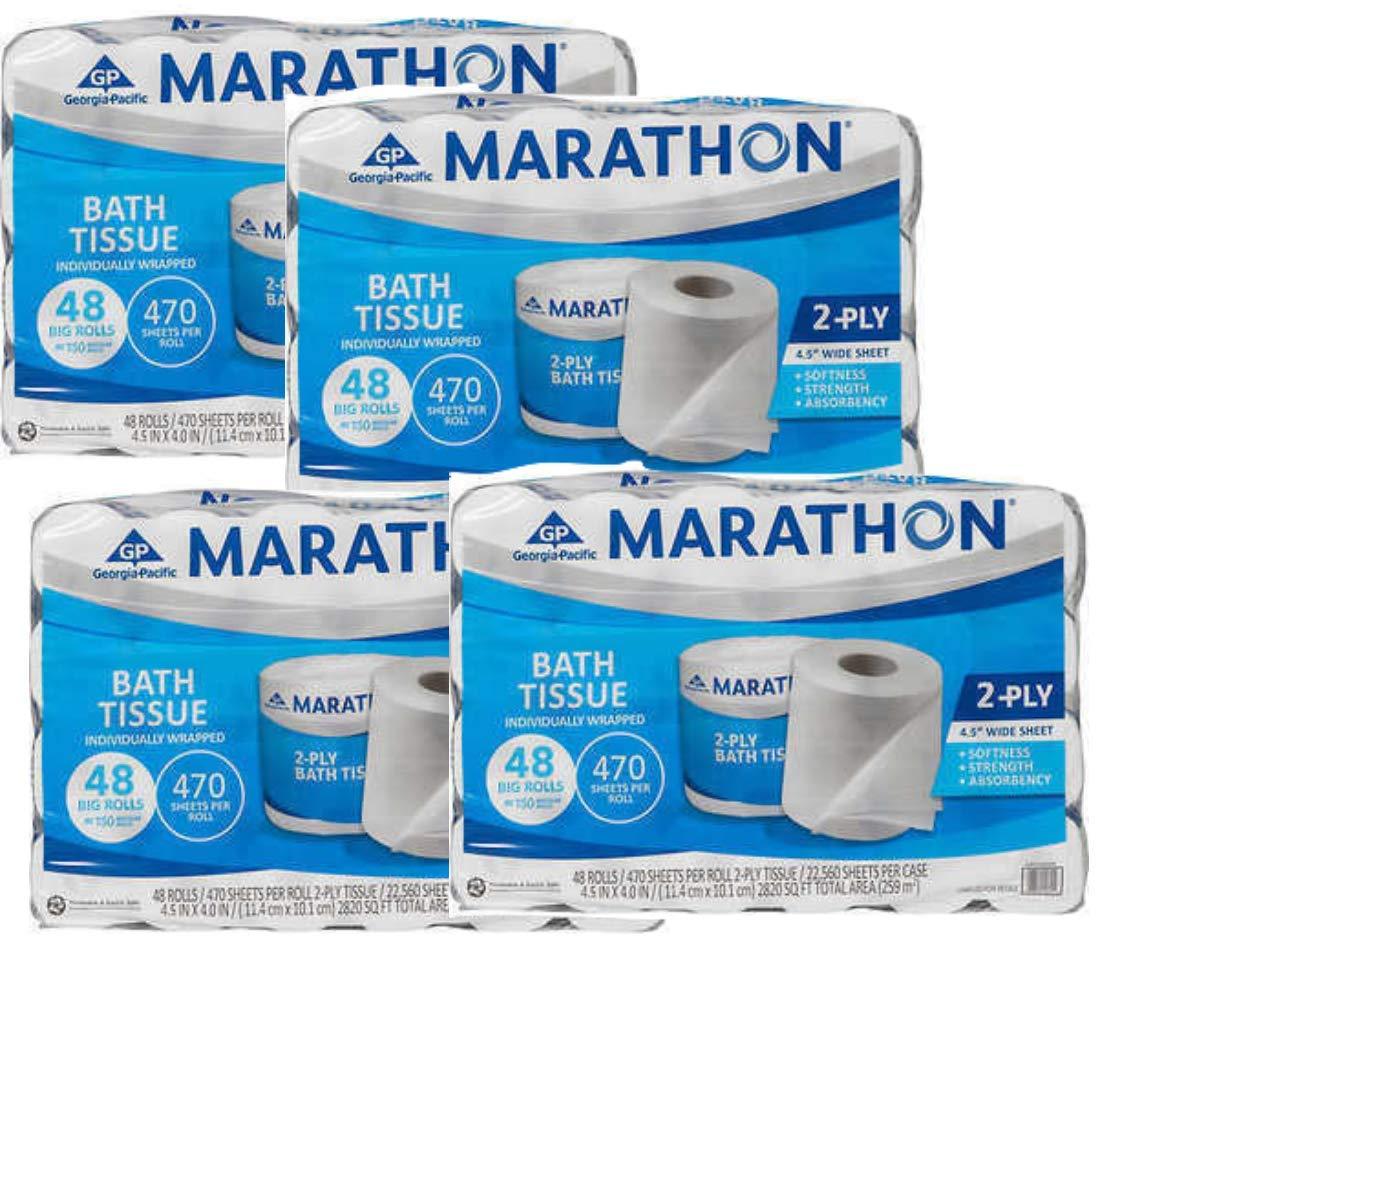 Marathon Embossed Bath Tissue, 48-pack. (pack of 4)